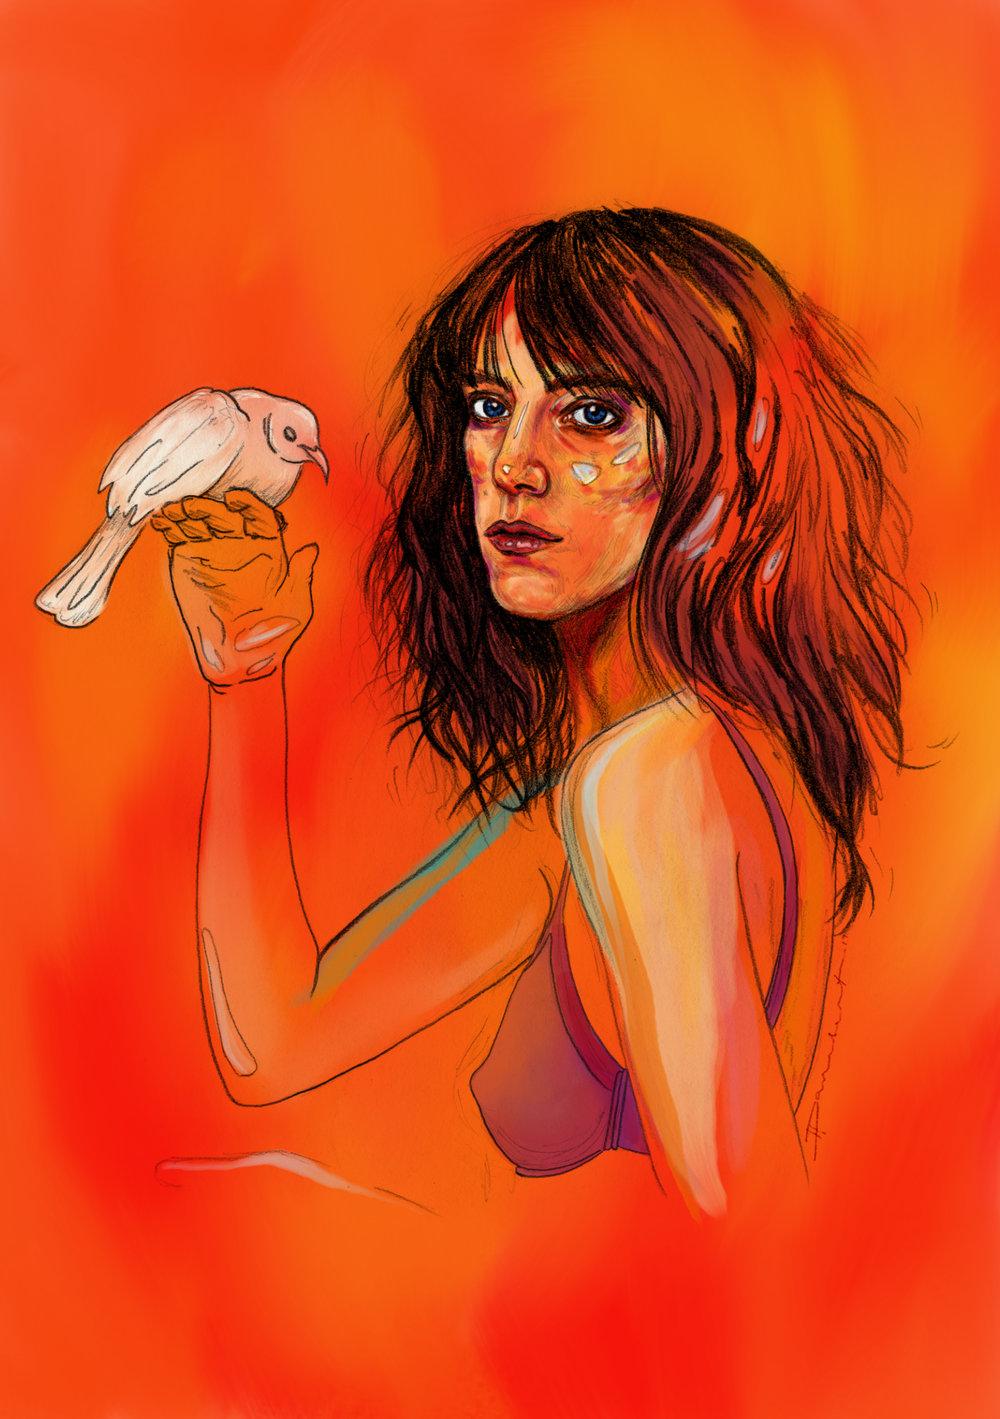 Illustration by Frances Danckert